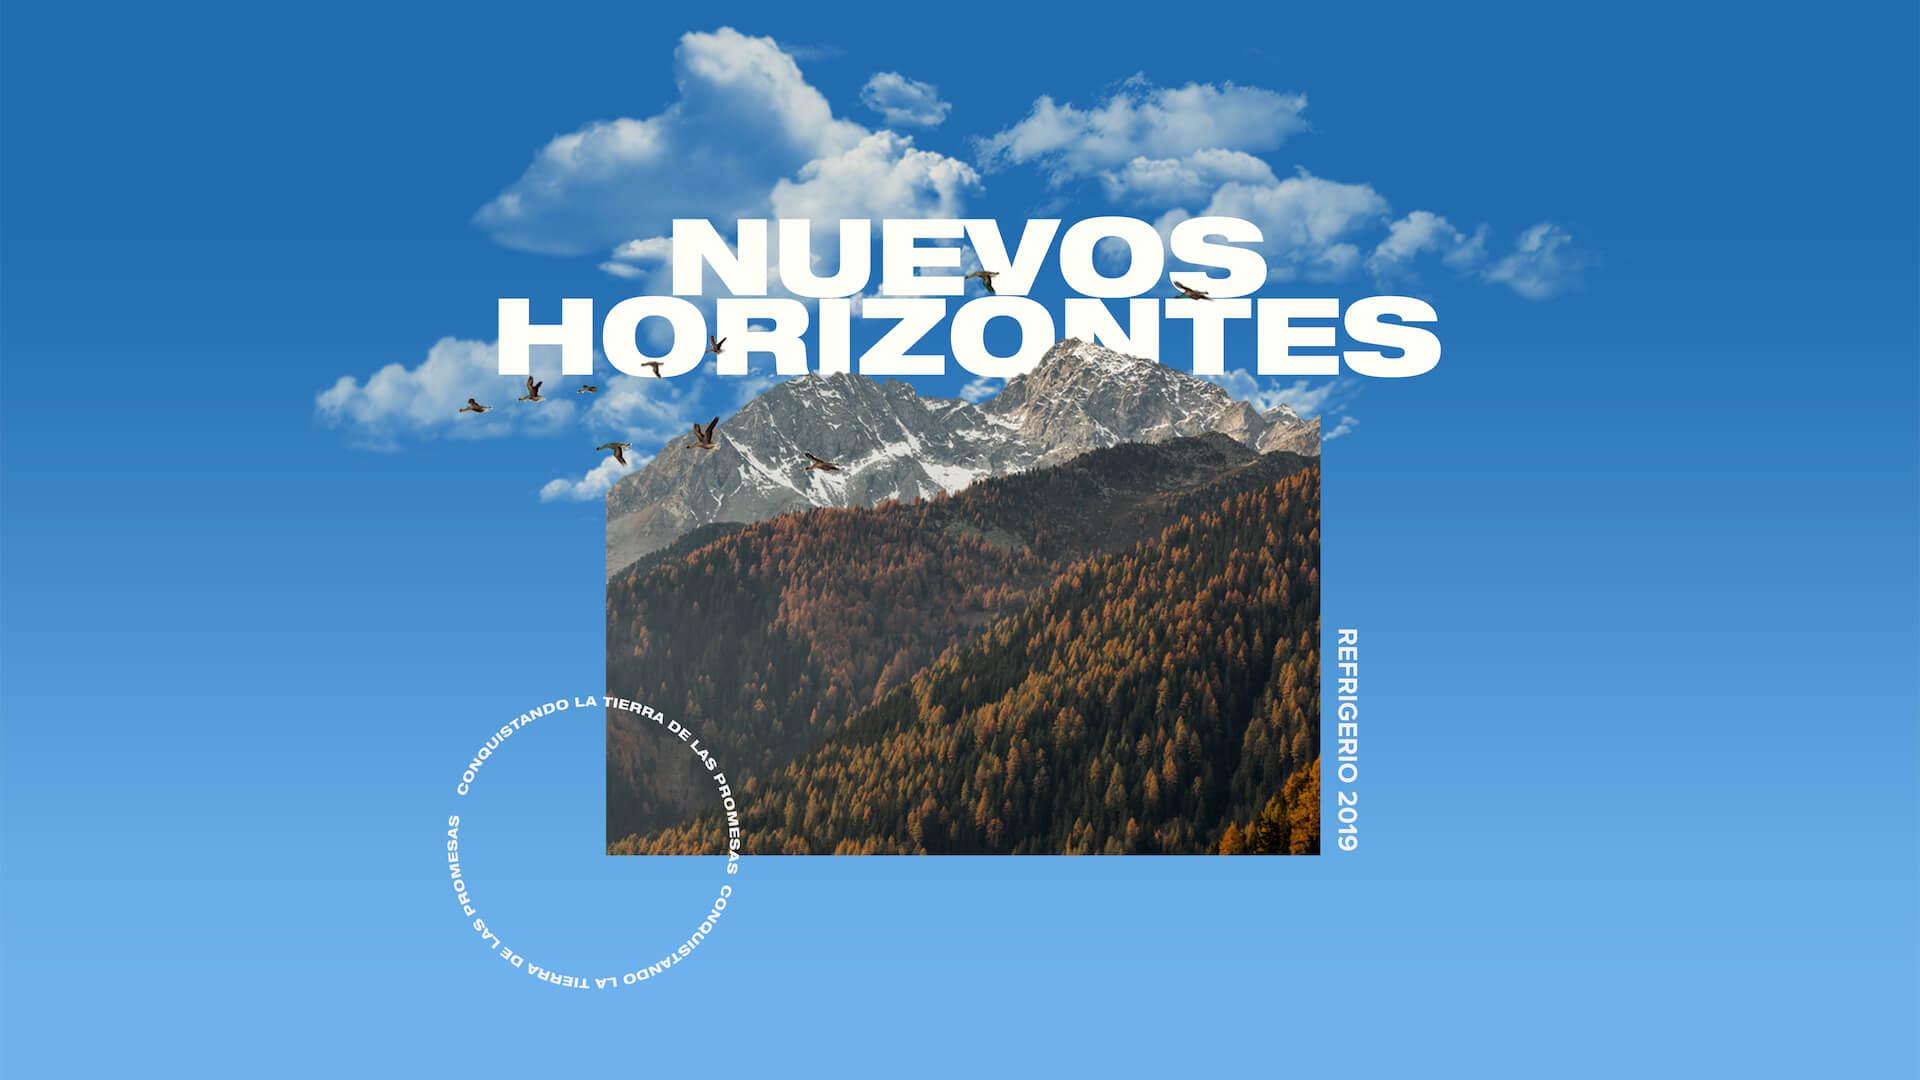 NuevosHorizontes_Web.jpg